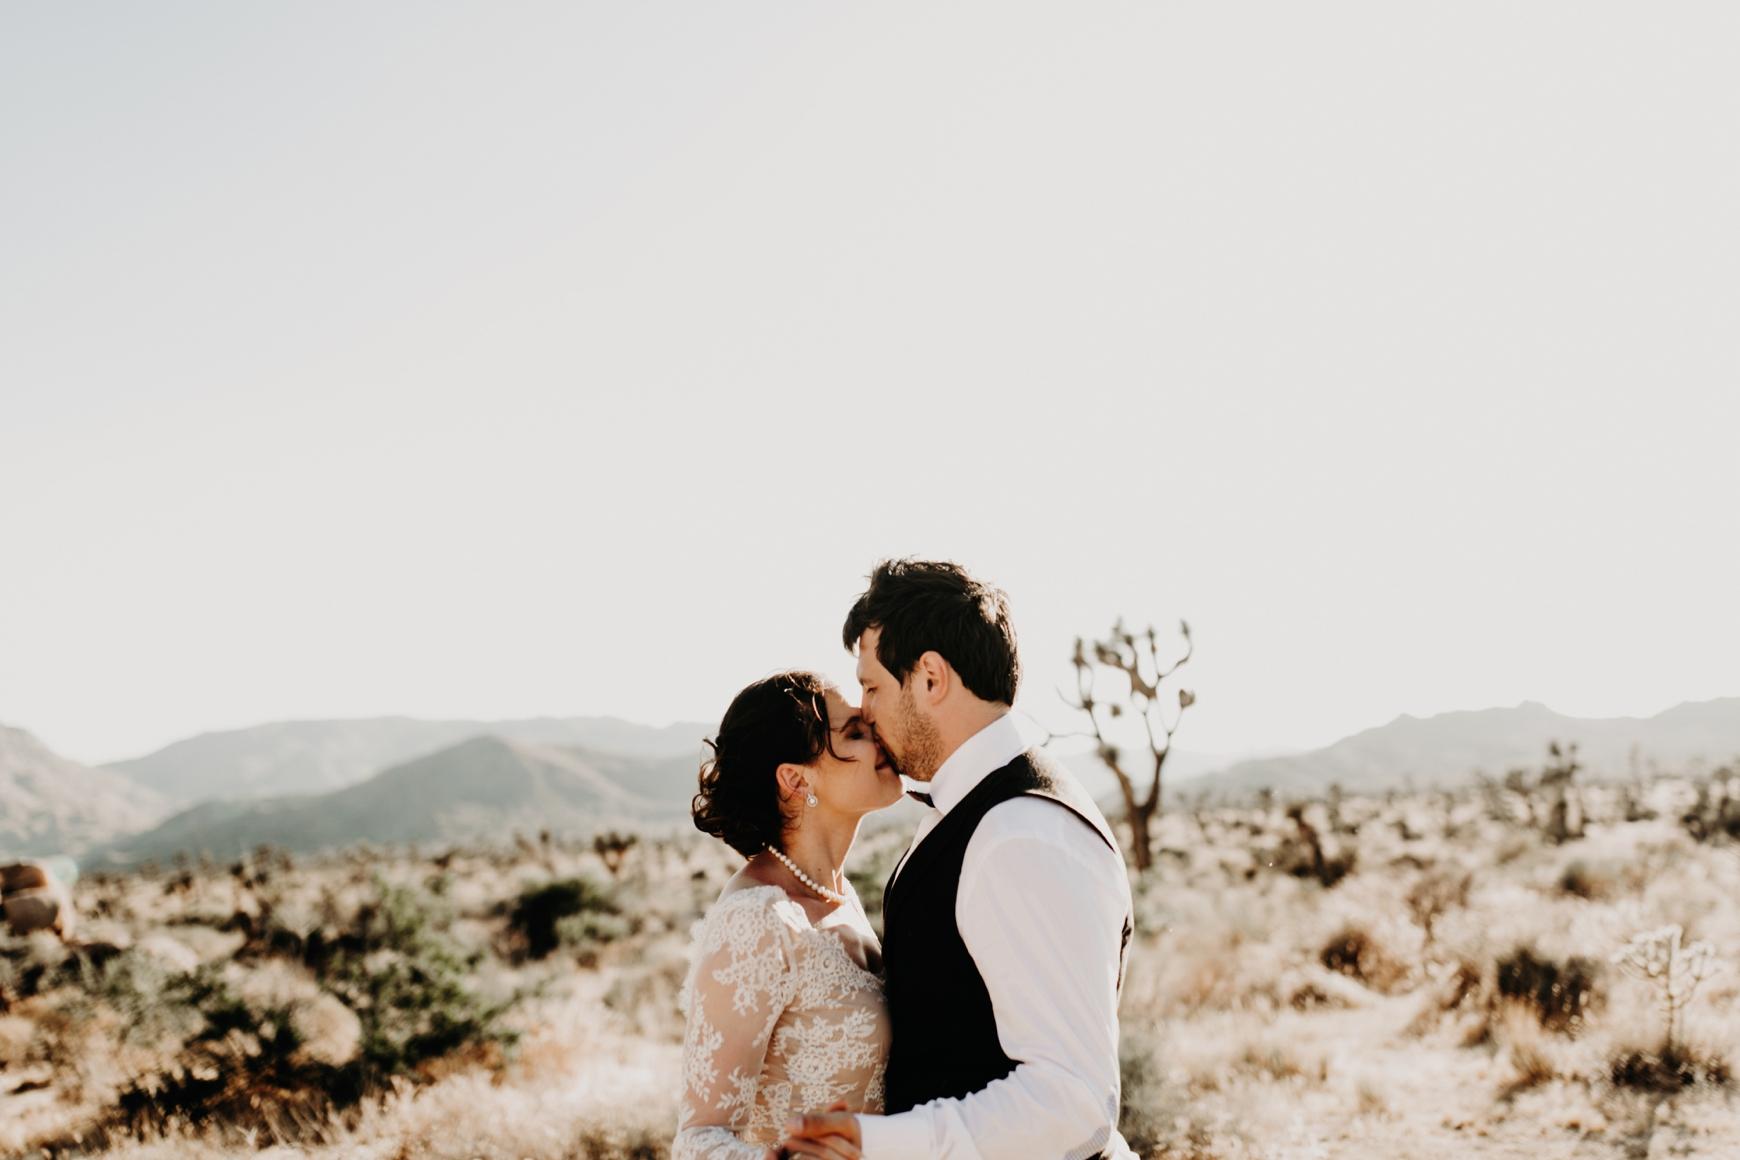 Joshua Tree Bridal Portraits Anastasia & Andrey Emily Magers Photography-70.jpg